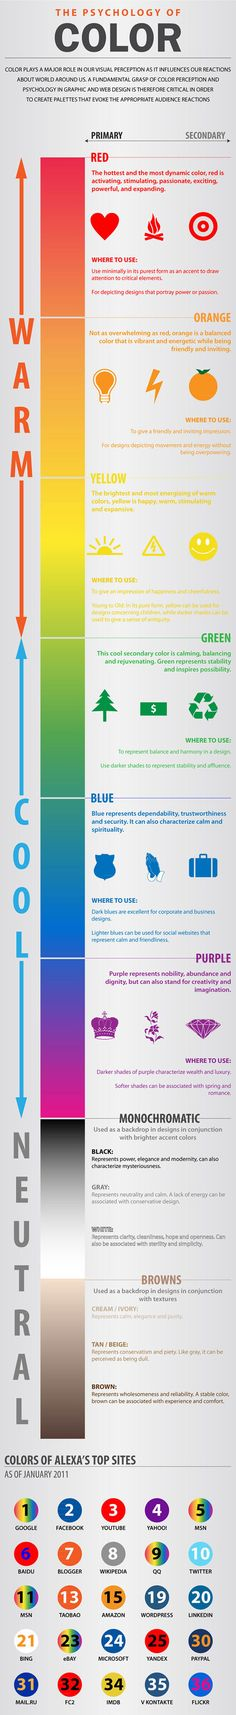 Infographic: The Psychology of Color for Web Design - Print Media Centr Visual Design, Graphisches Design, Logo Design, Design Layouts, Design Color, Flat Design, Branding Design, Design Ideas, Info Board